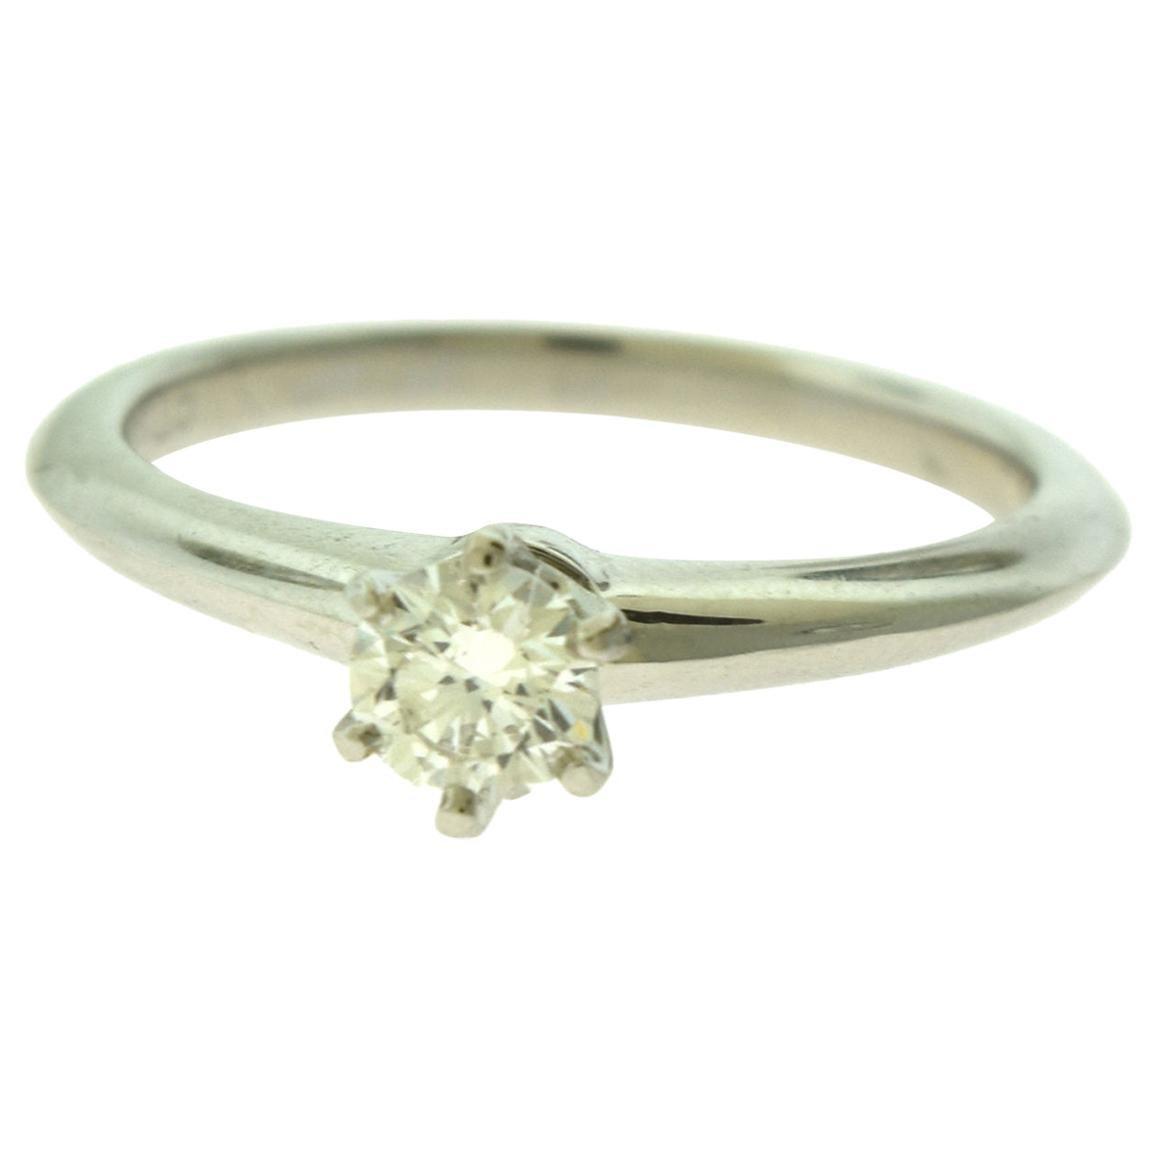 Tiffany & Co. Tiffany Diamond Single Solitaire Platinum Engagement Ring